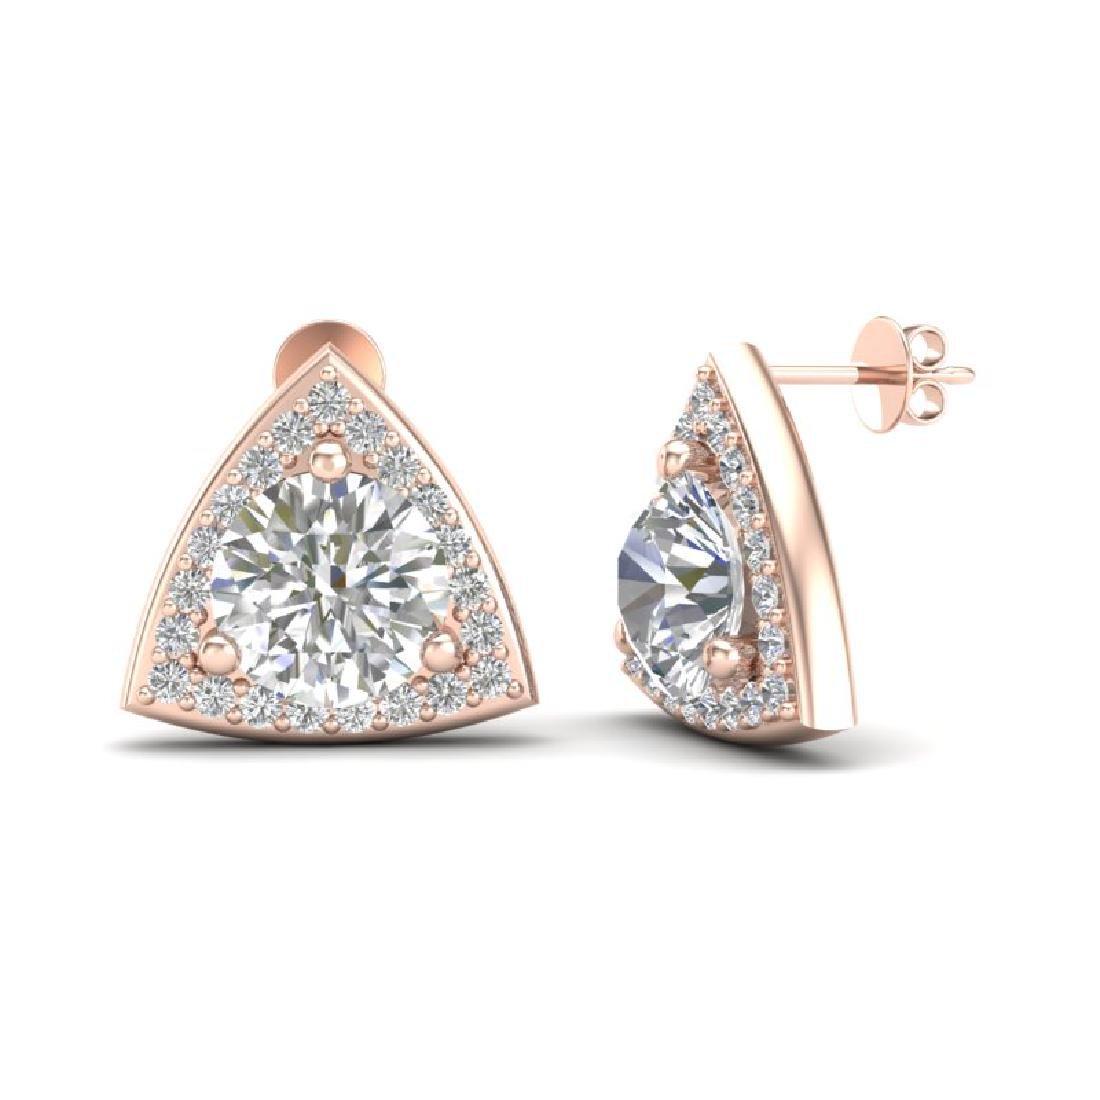 3 CTW VS/SI Diamond Stud Earrings 14K Rose Gold - 2